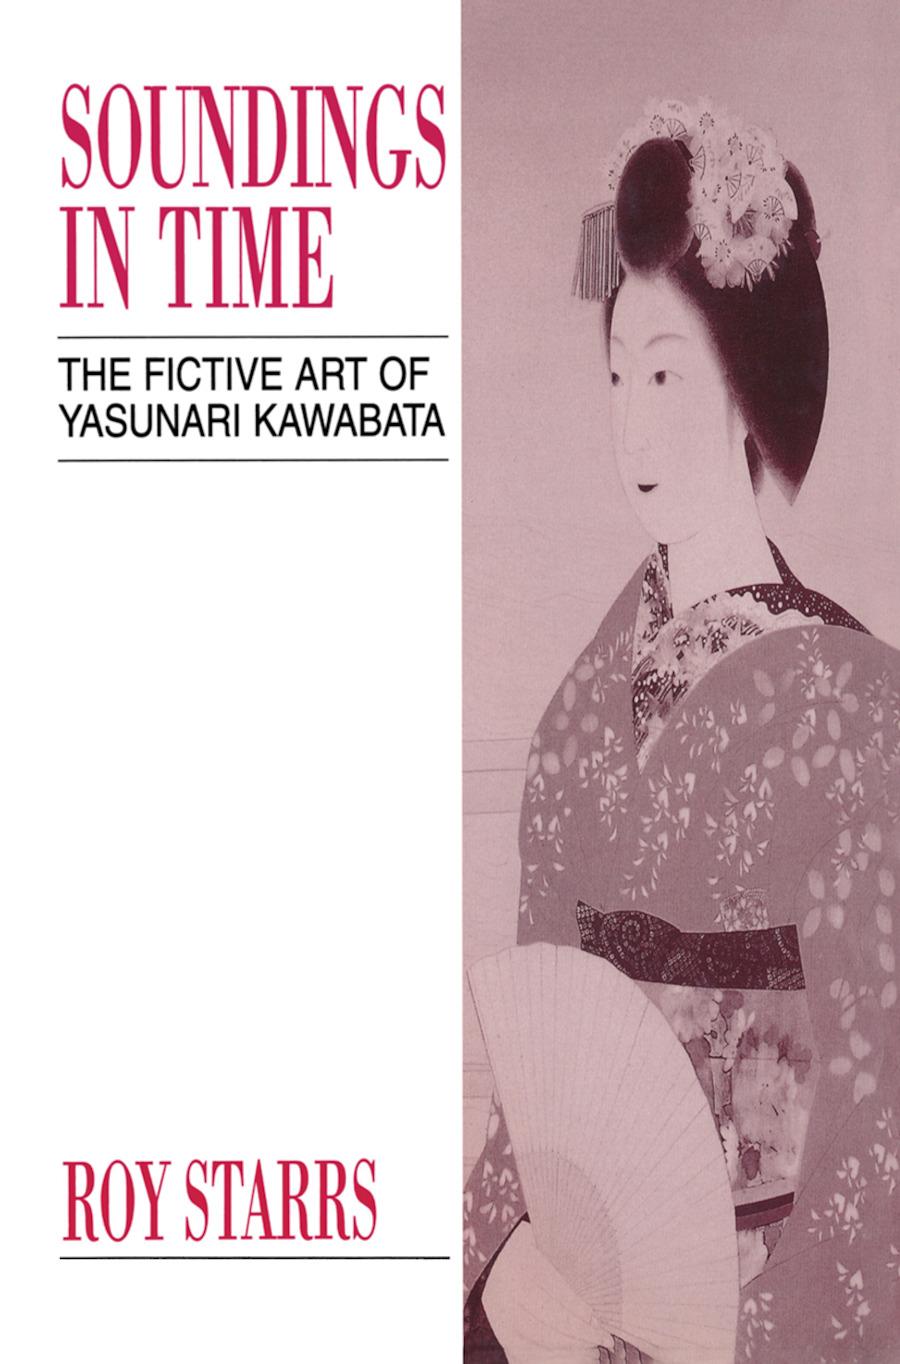 Soundings in Time: The Fictive Art of Yasunari Kawabata book cover